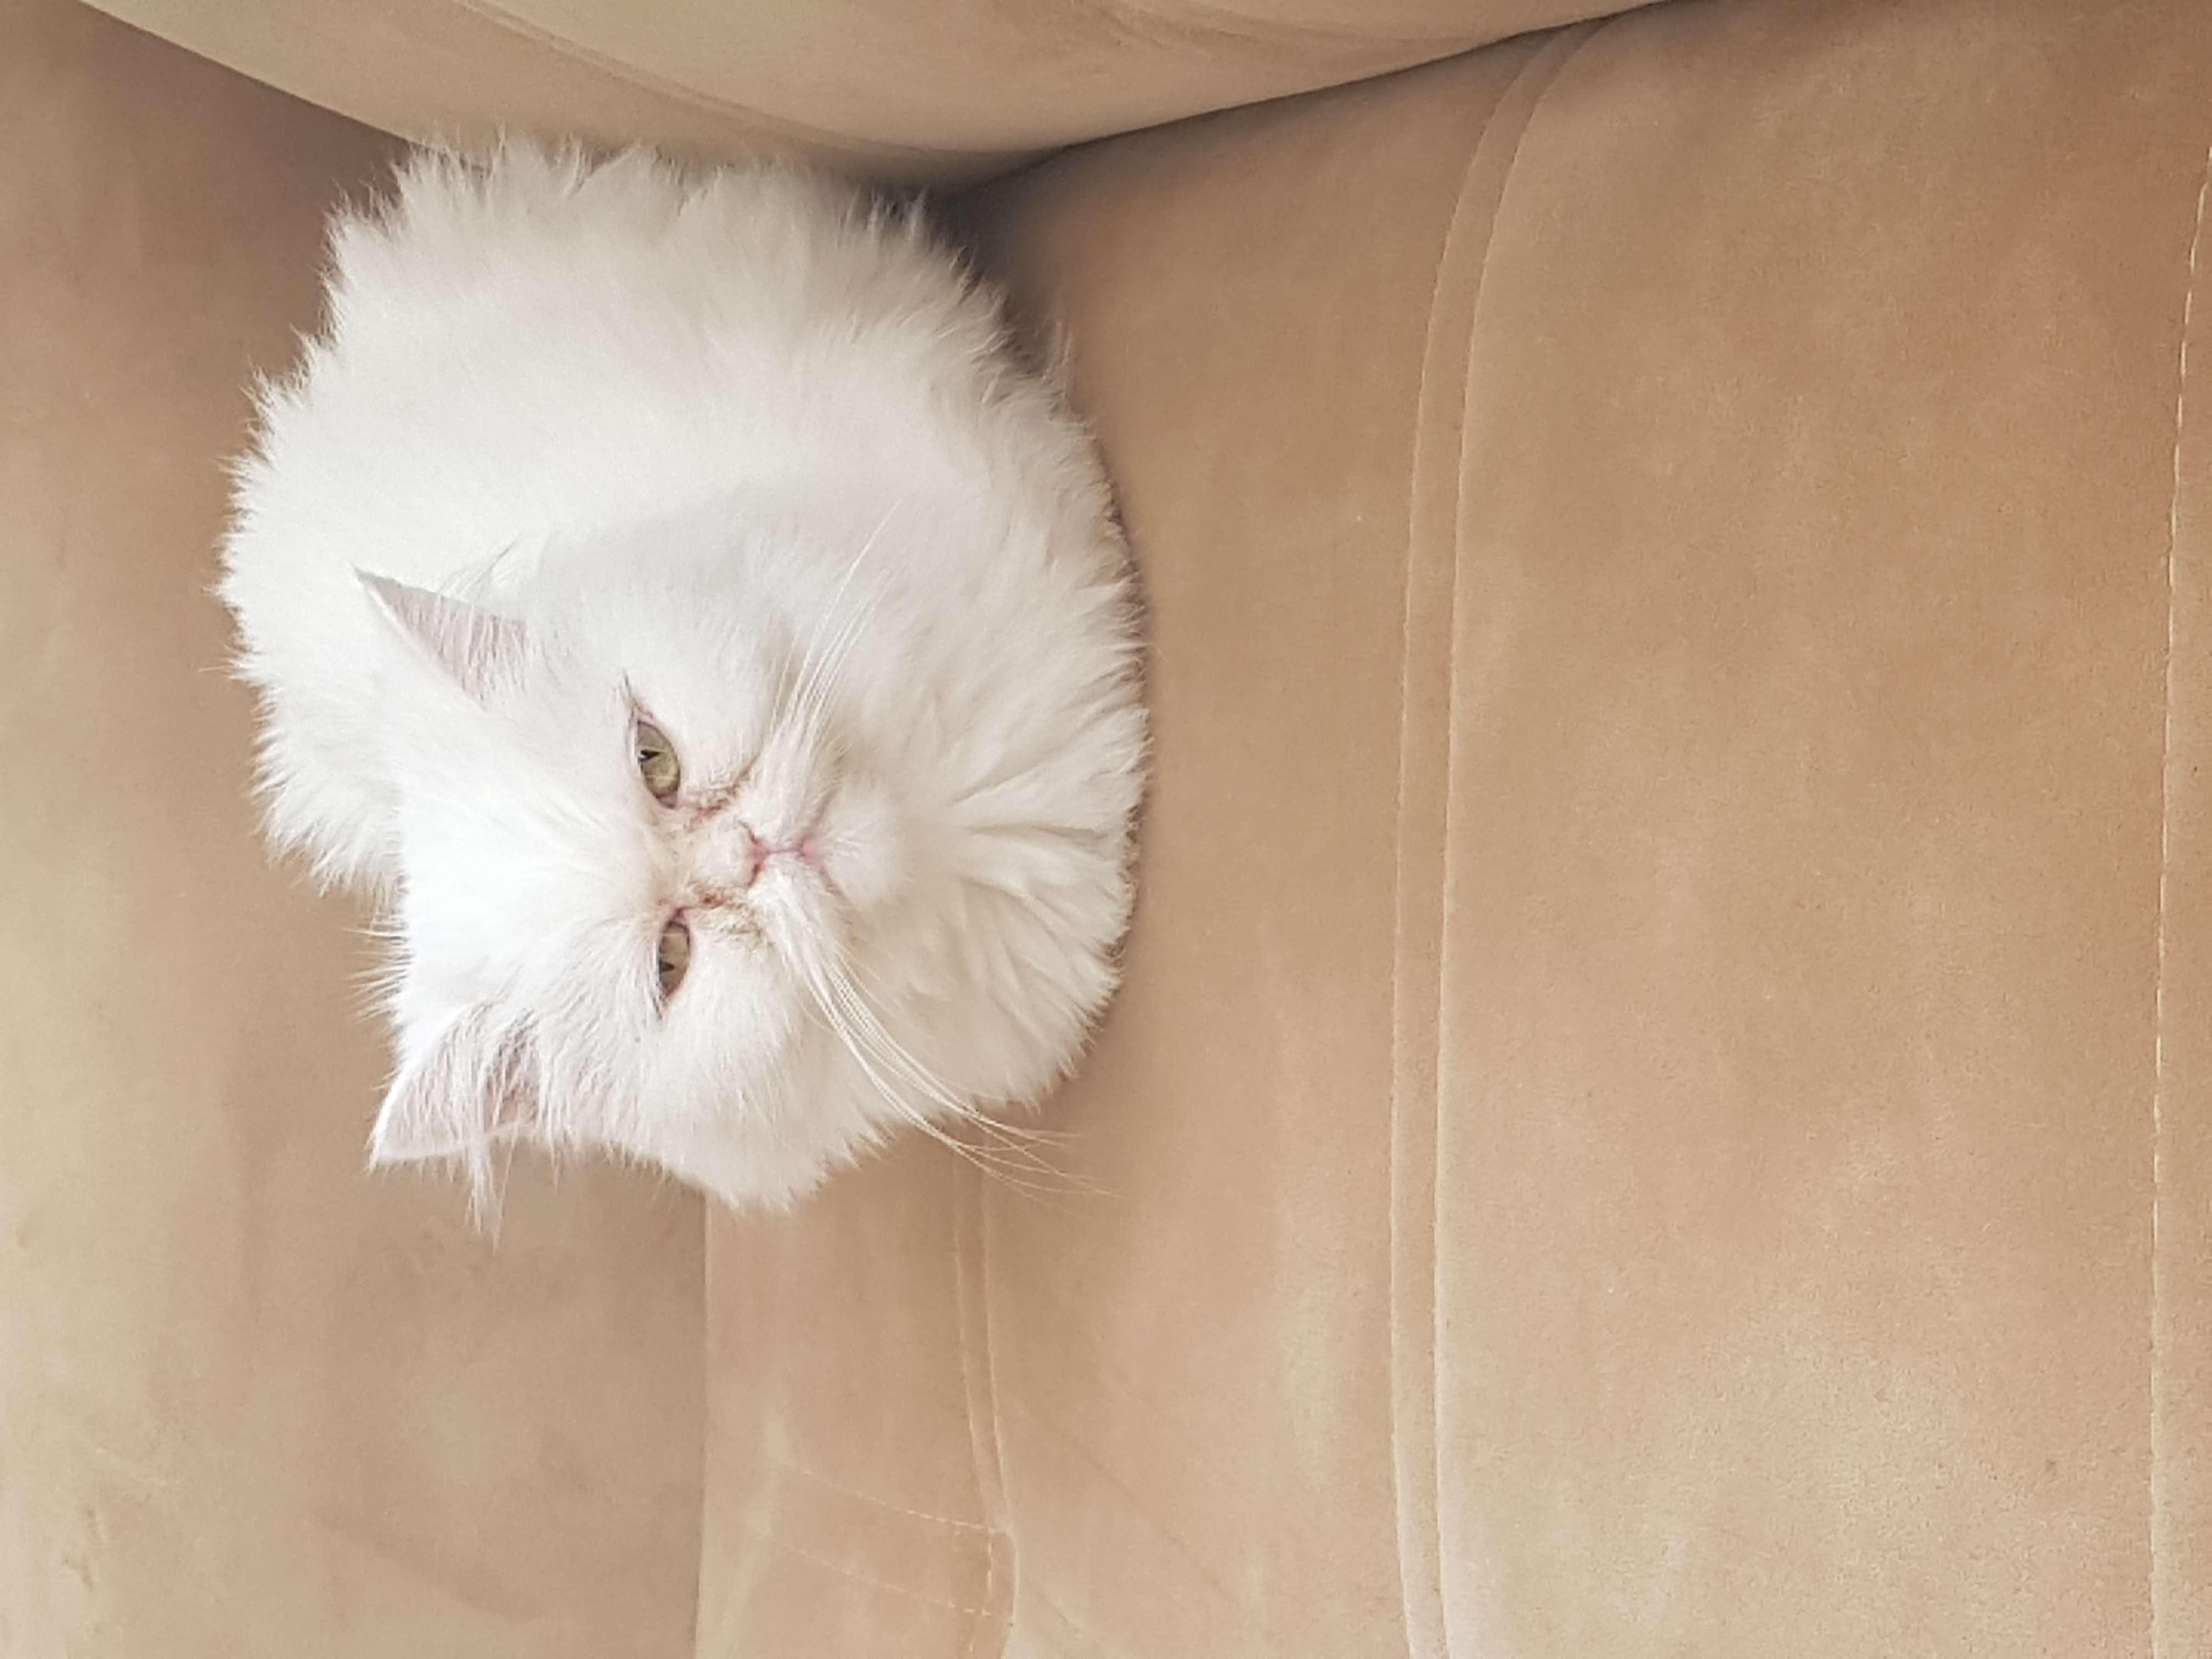 Kedim kayip